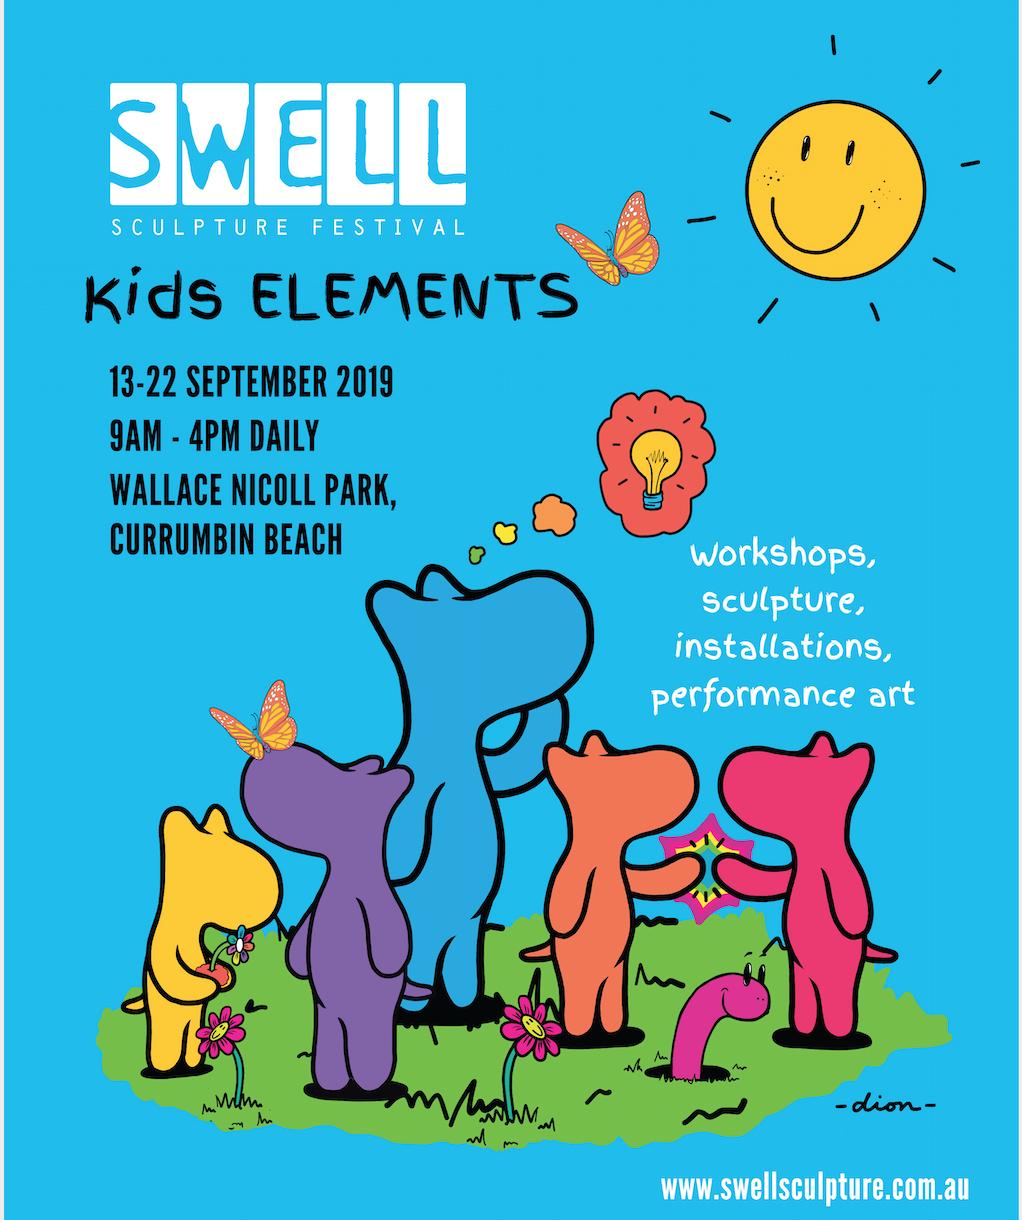 SWELL Kids Elements 2019 Poster.jpg